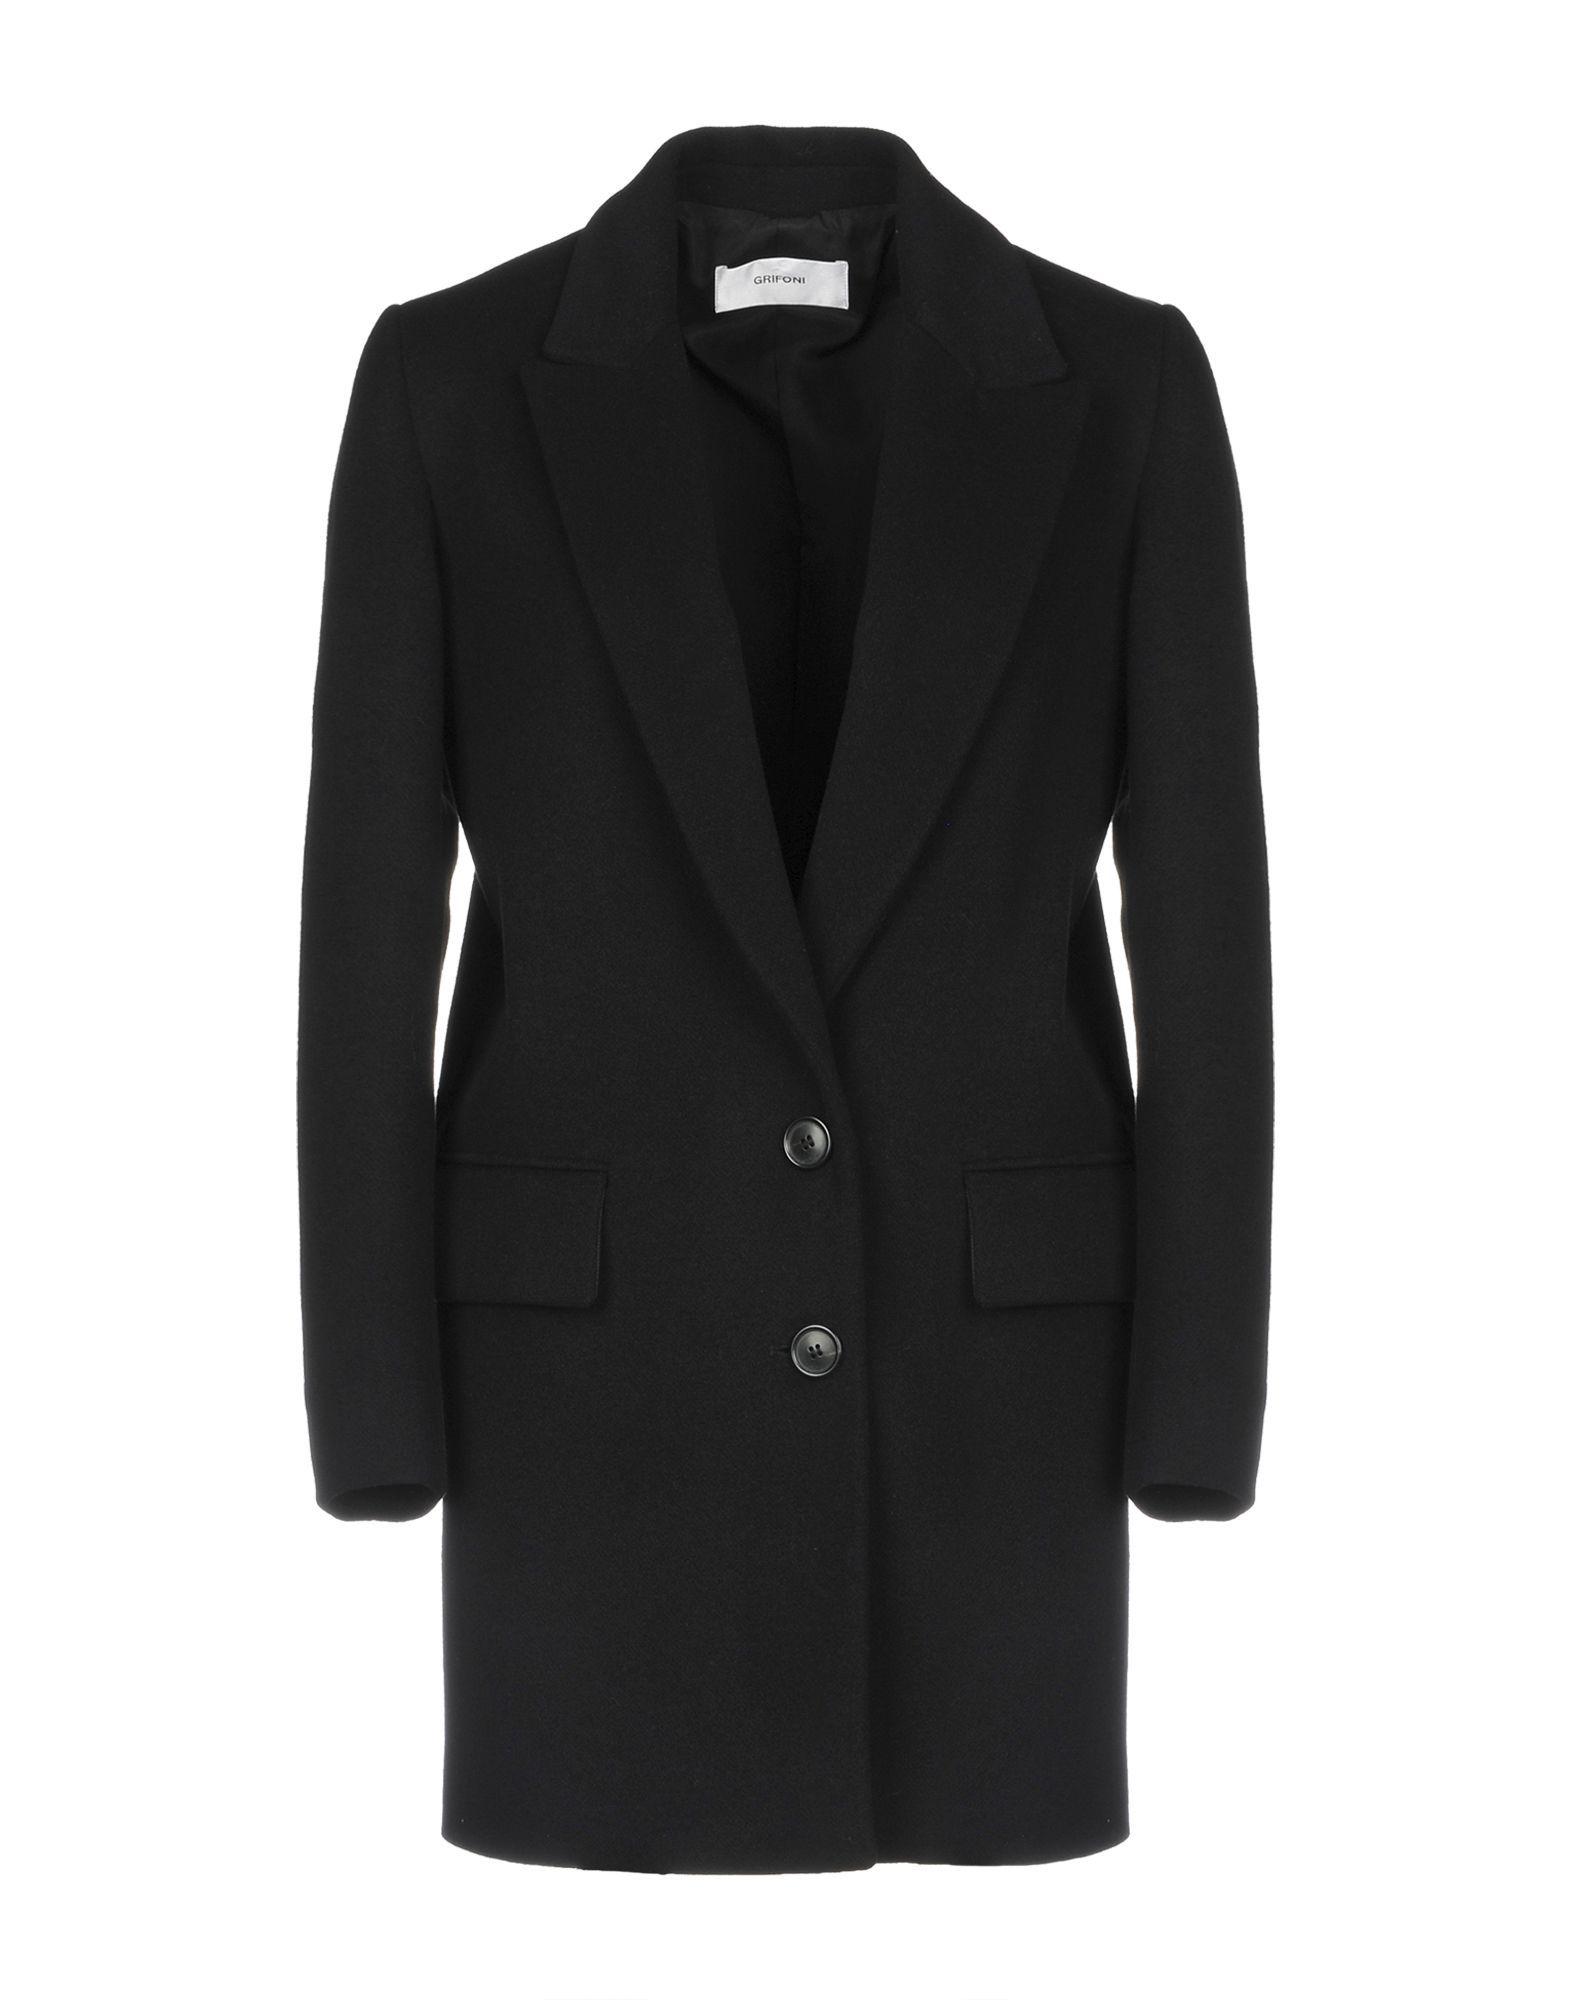 Mauro Grifoni Black Wool Single Breasted Jacket